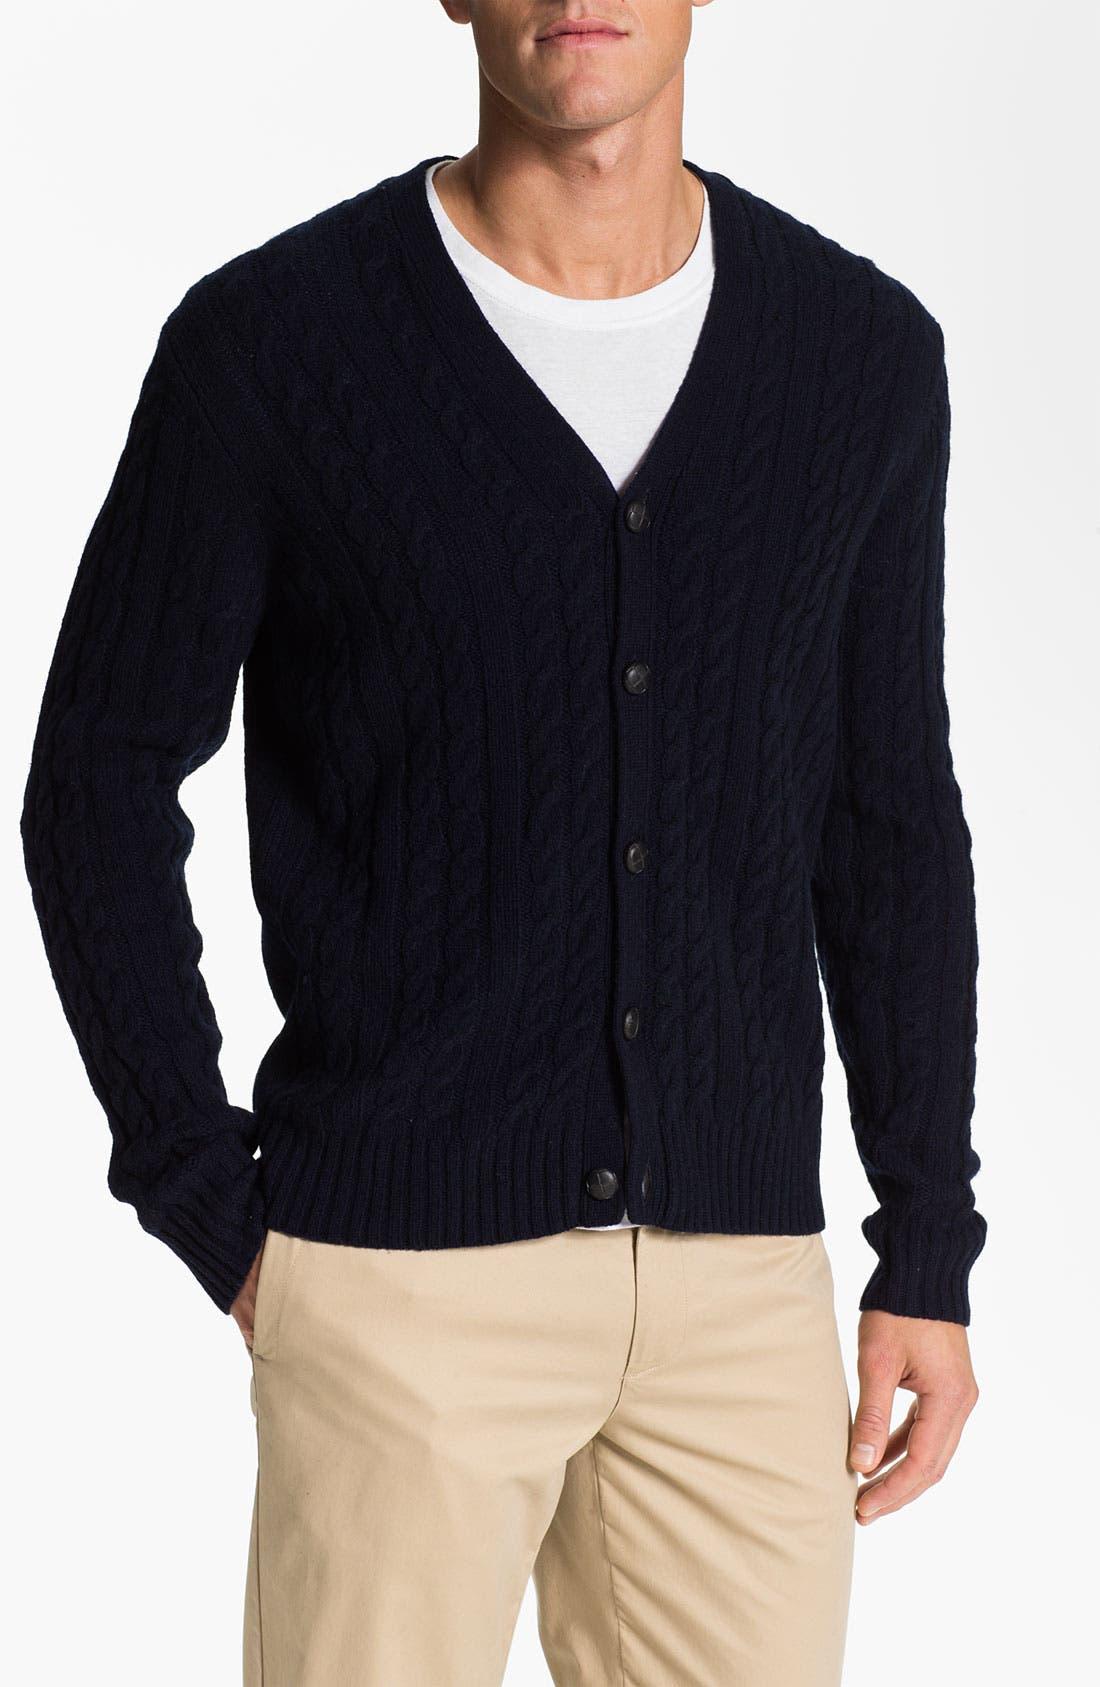 Main Image - Ben Sherman Cable Knit Cardigan